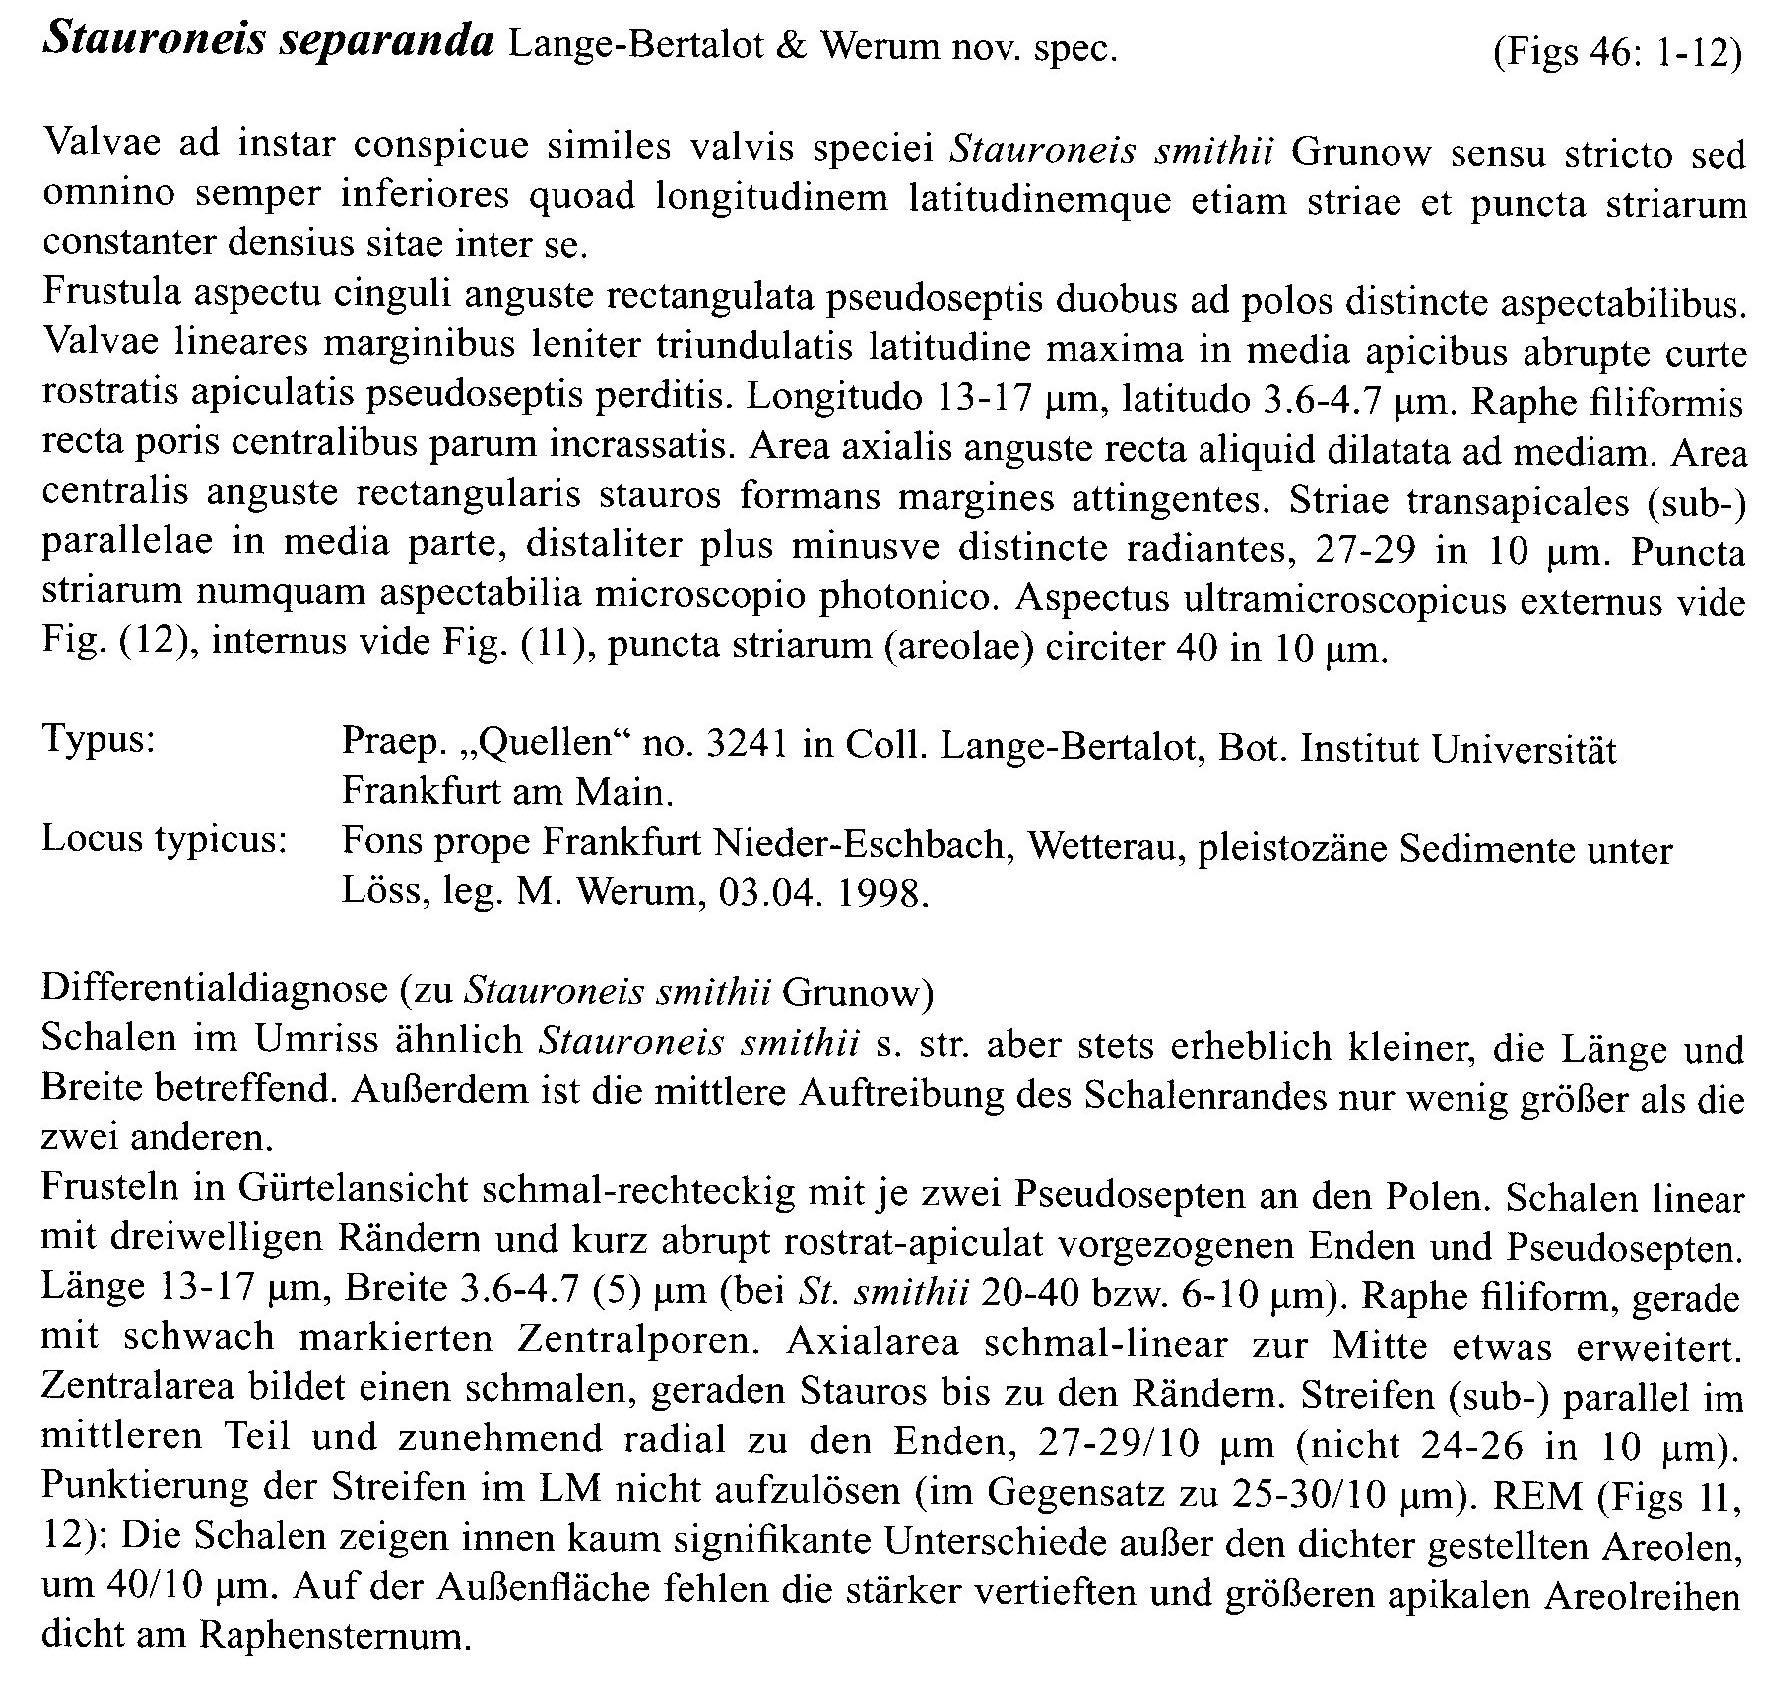 Stauroneis Separanda Origdesc016